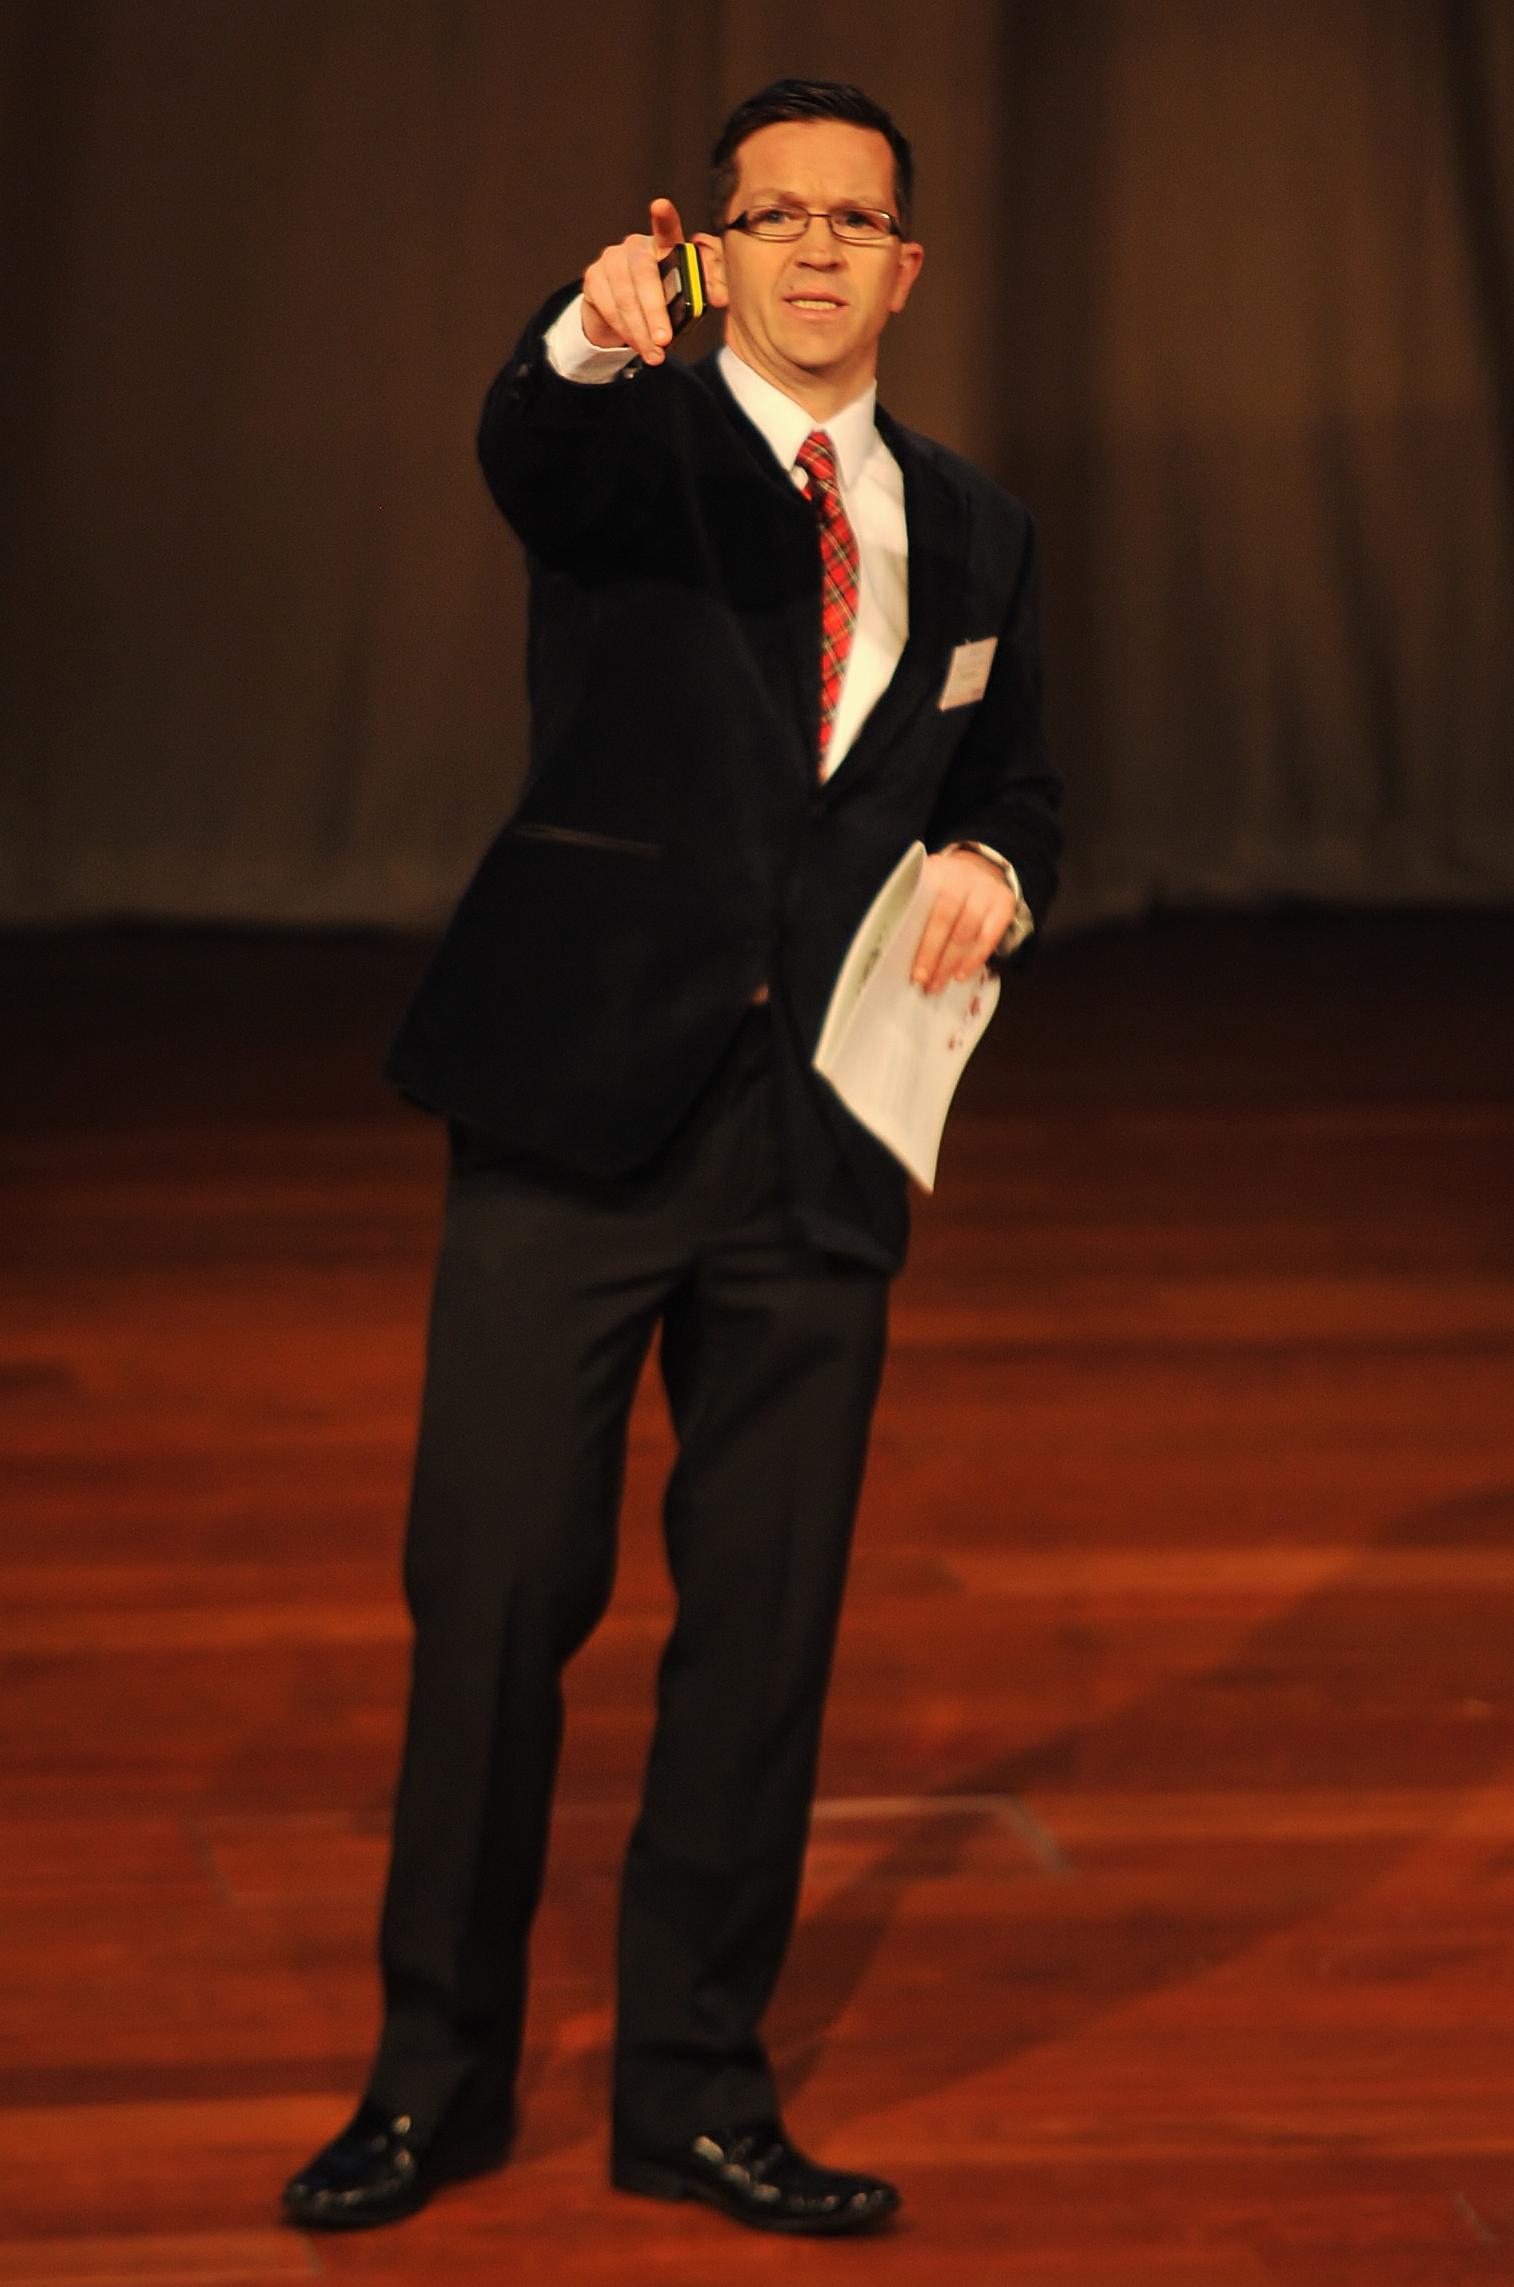 Presentation Training